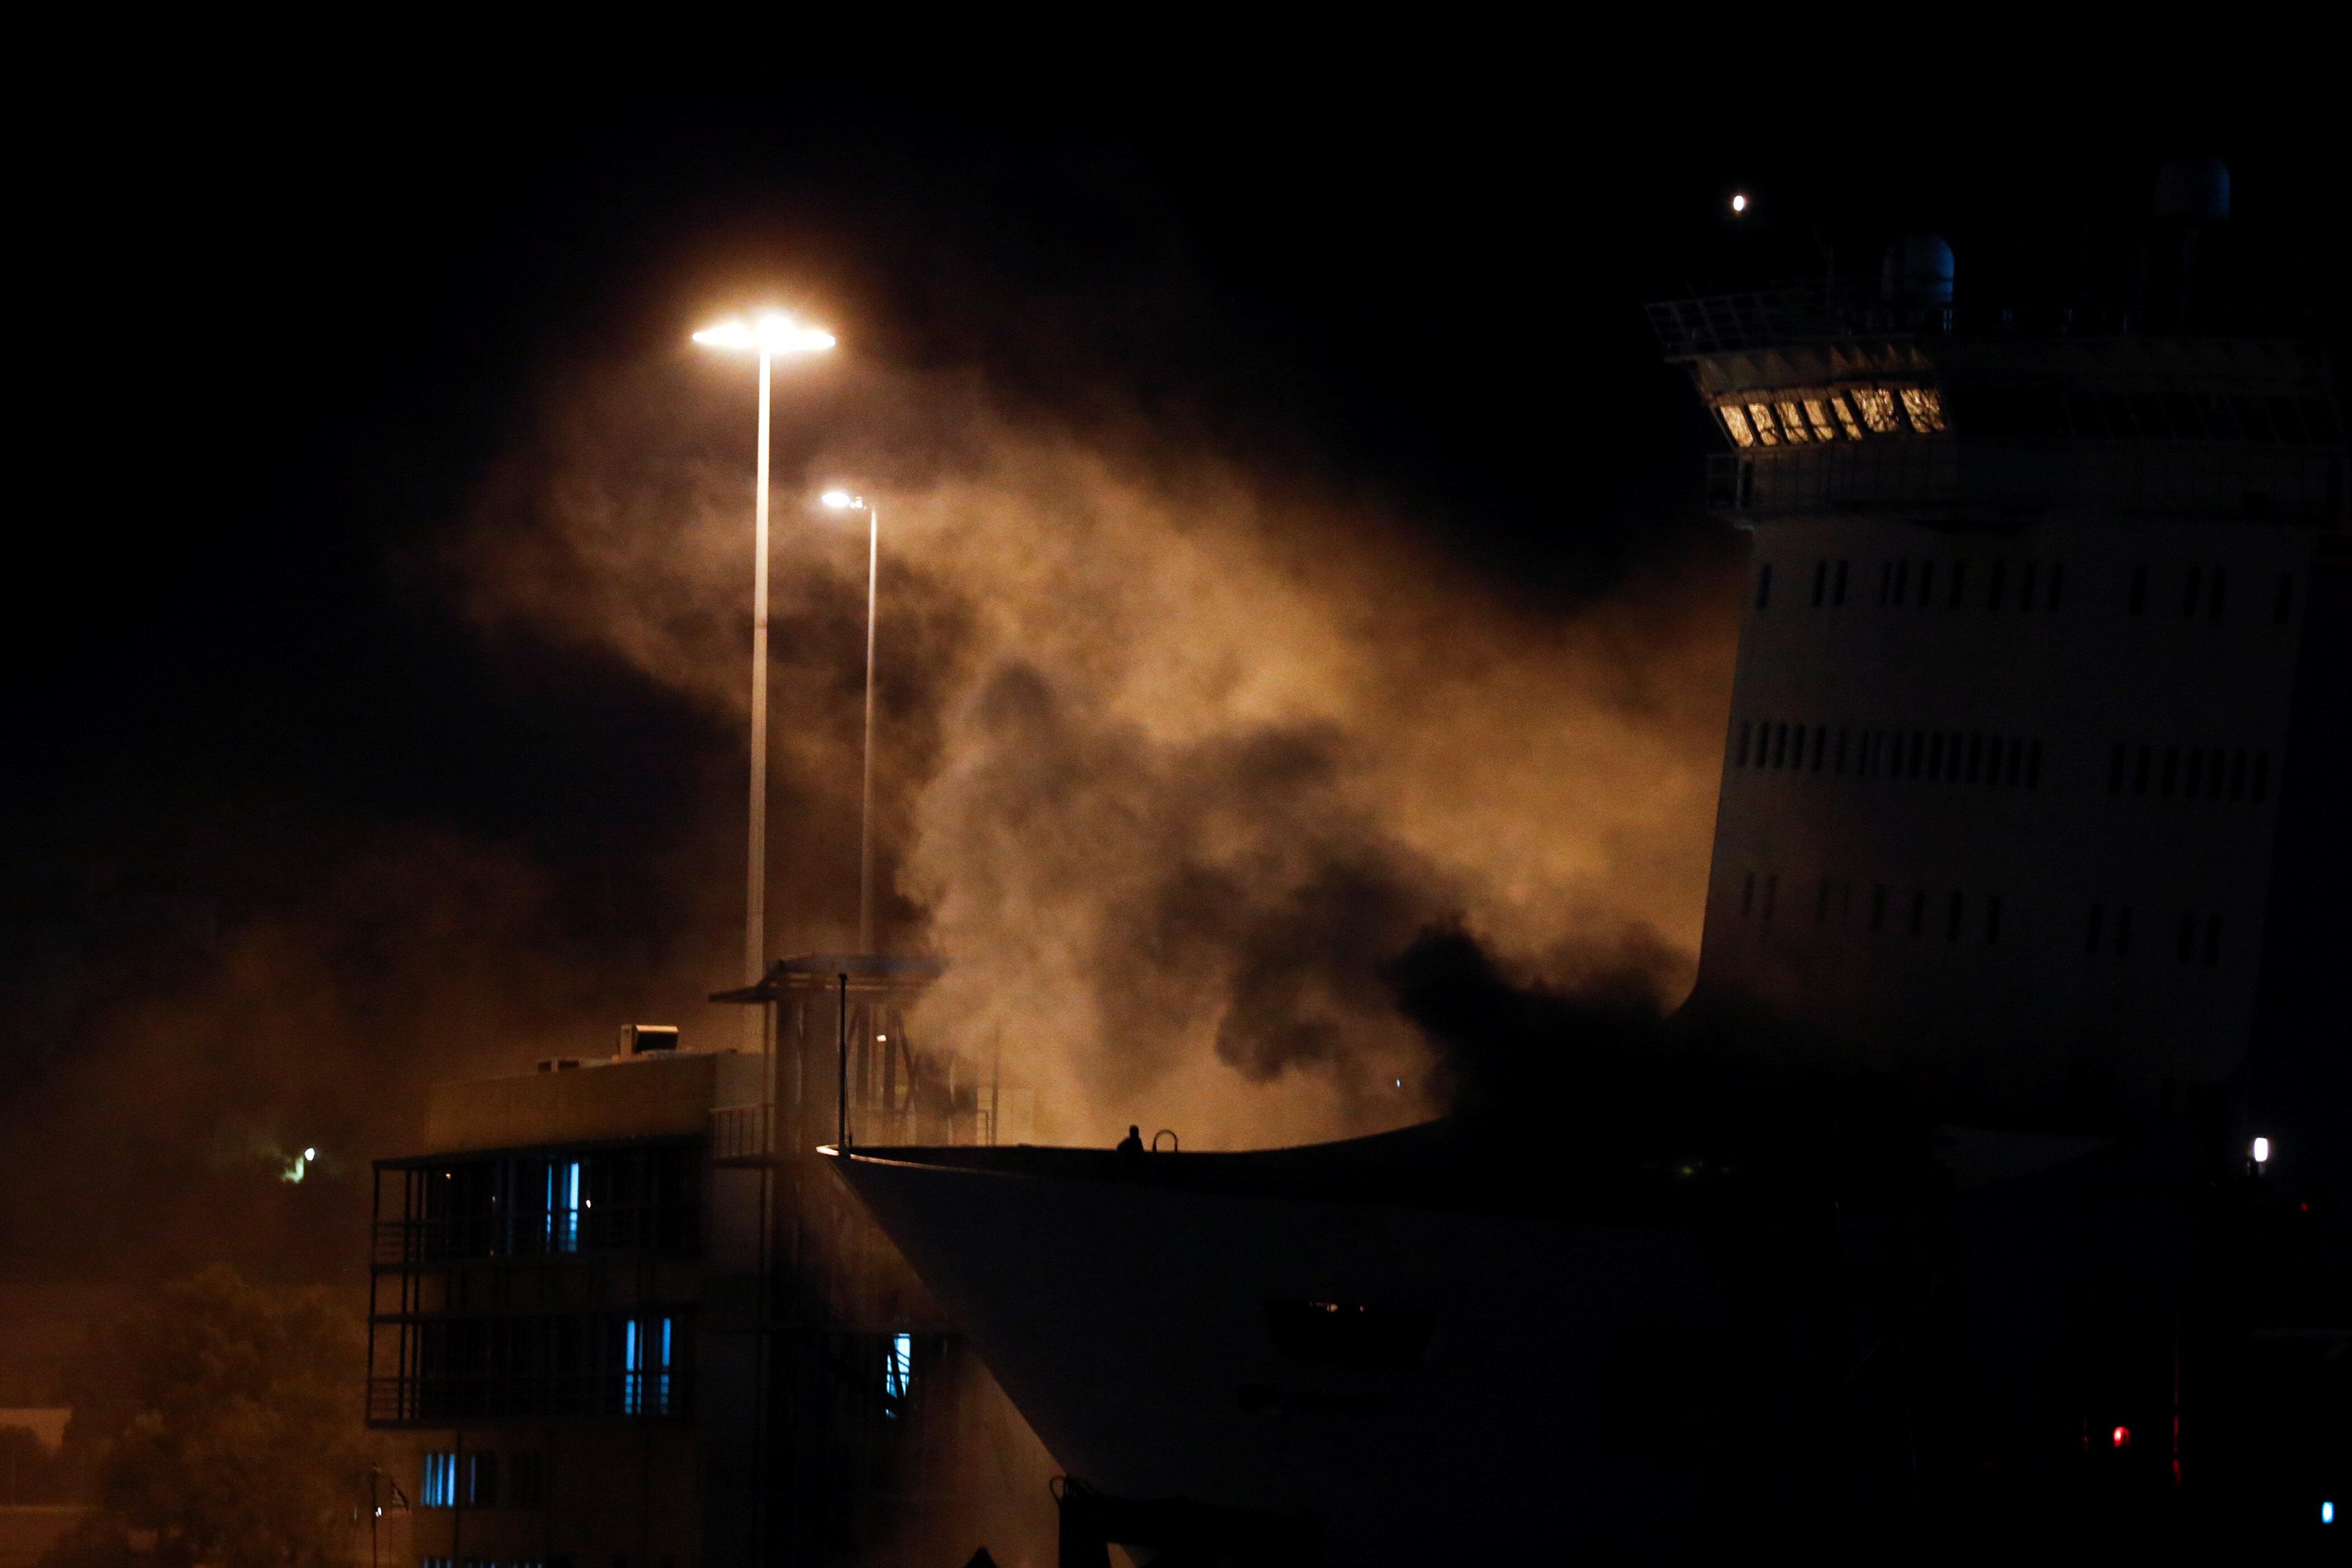 Fire on the Eleftherios Venizelos ferry